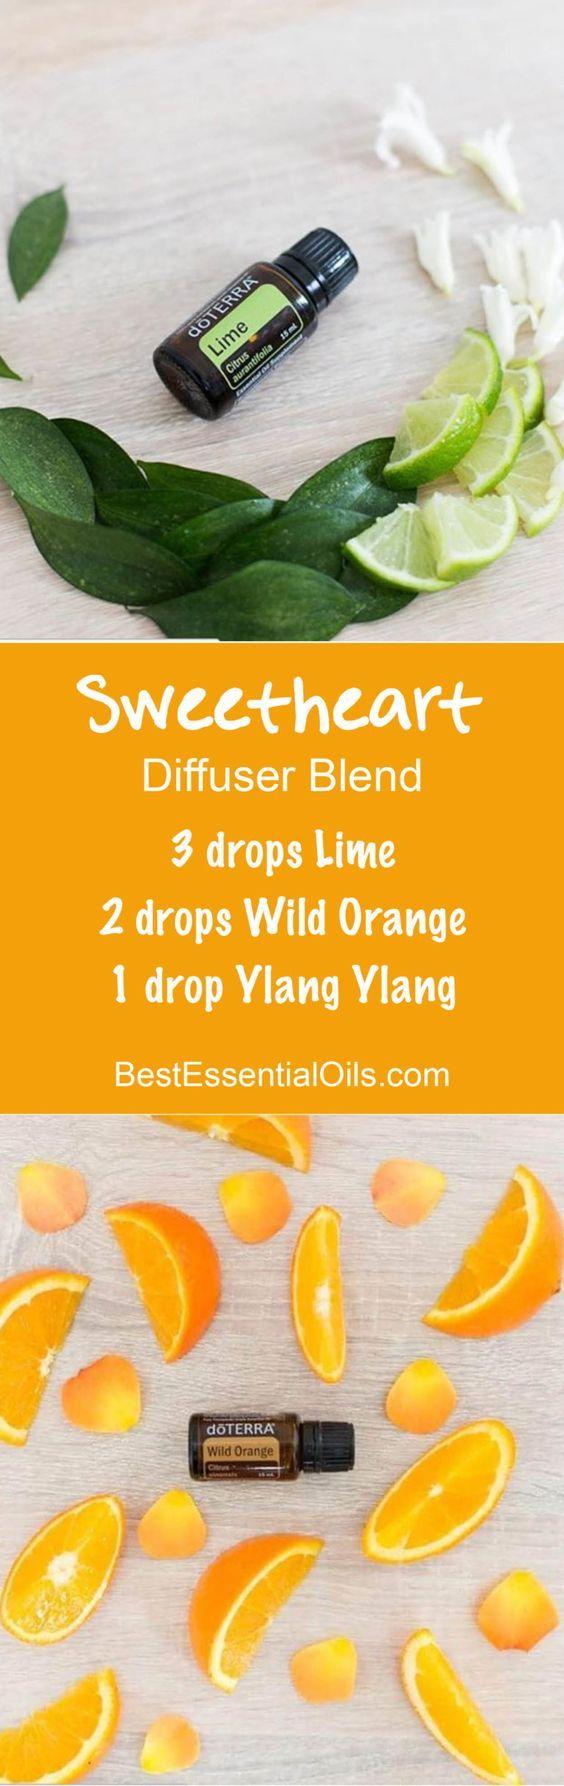 doTERRA Essential Oils Sweetheart Diffuser Blend